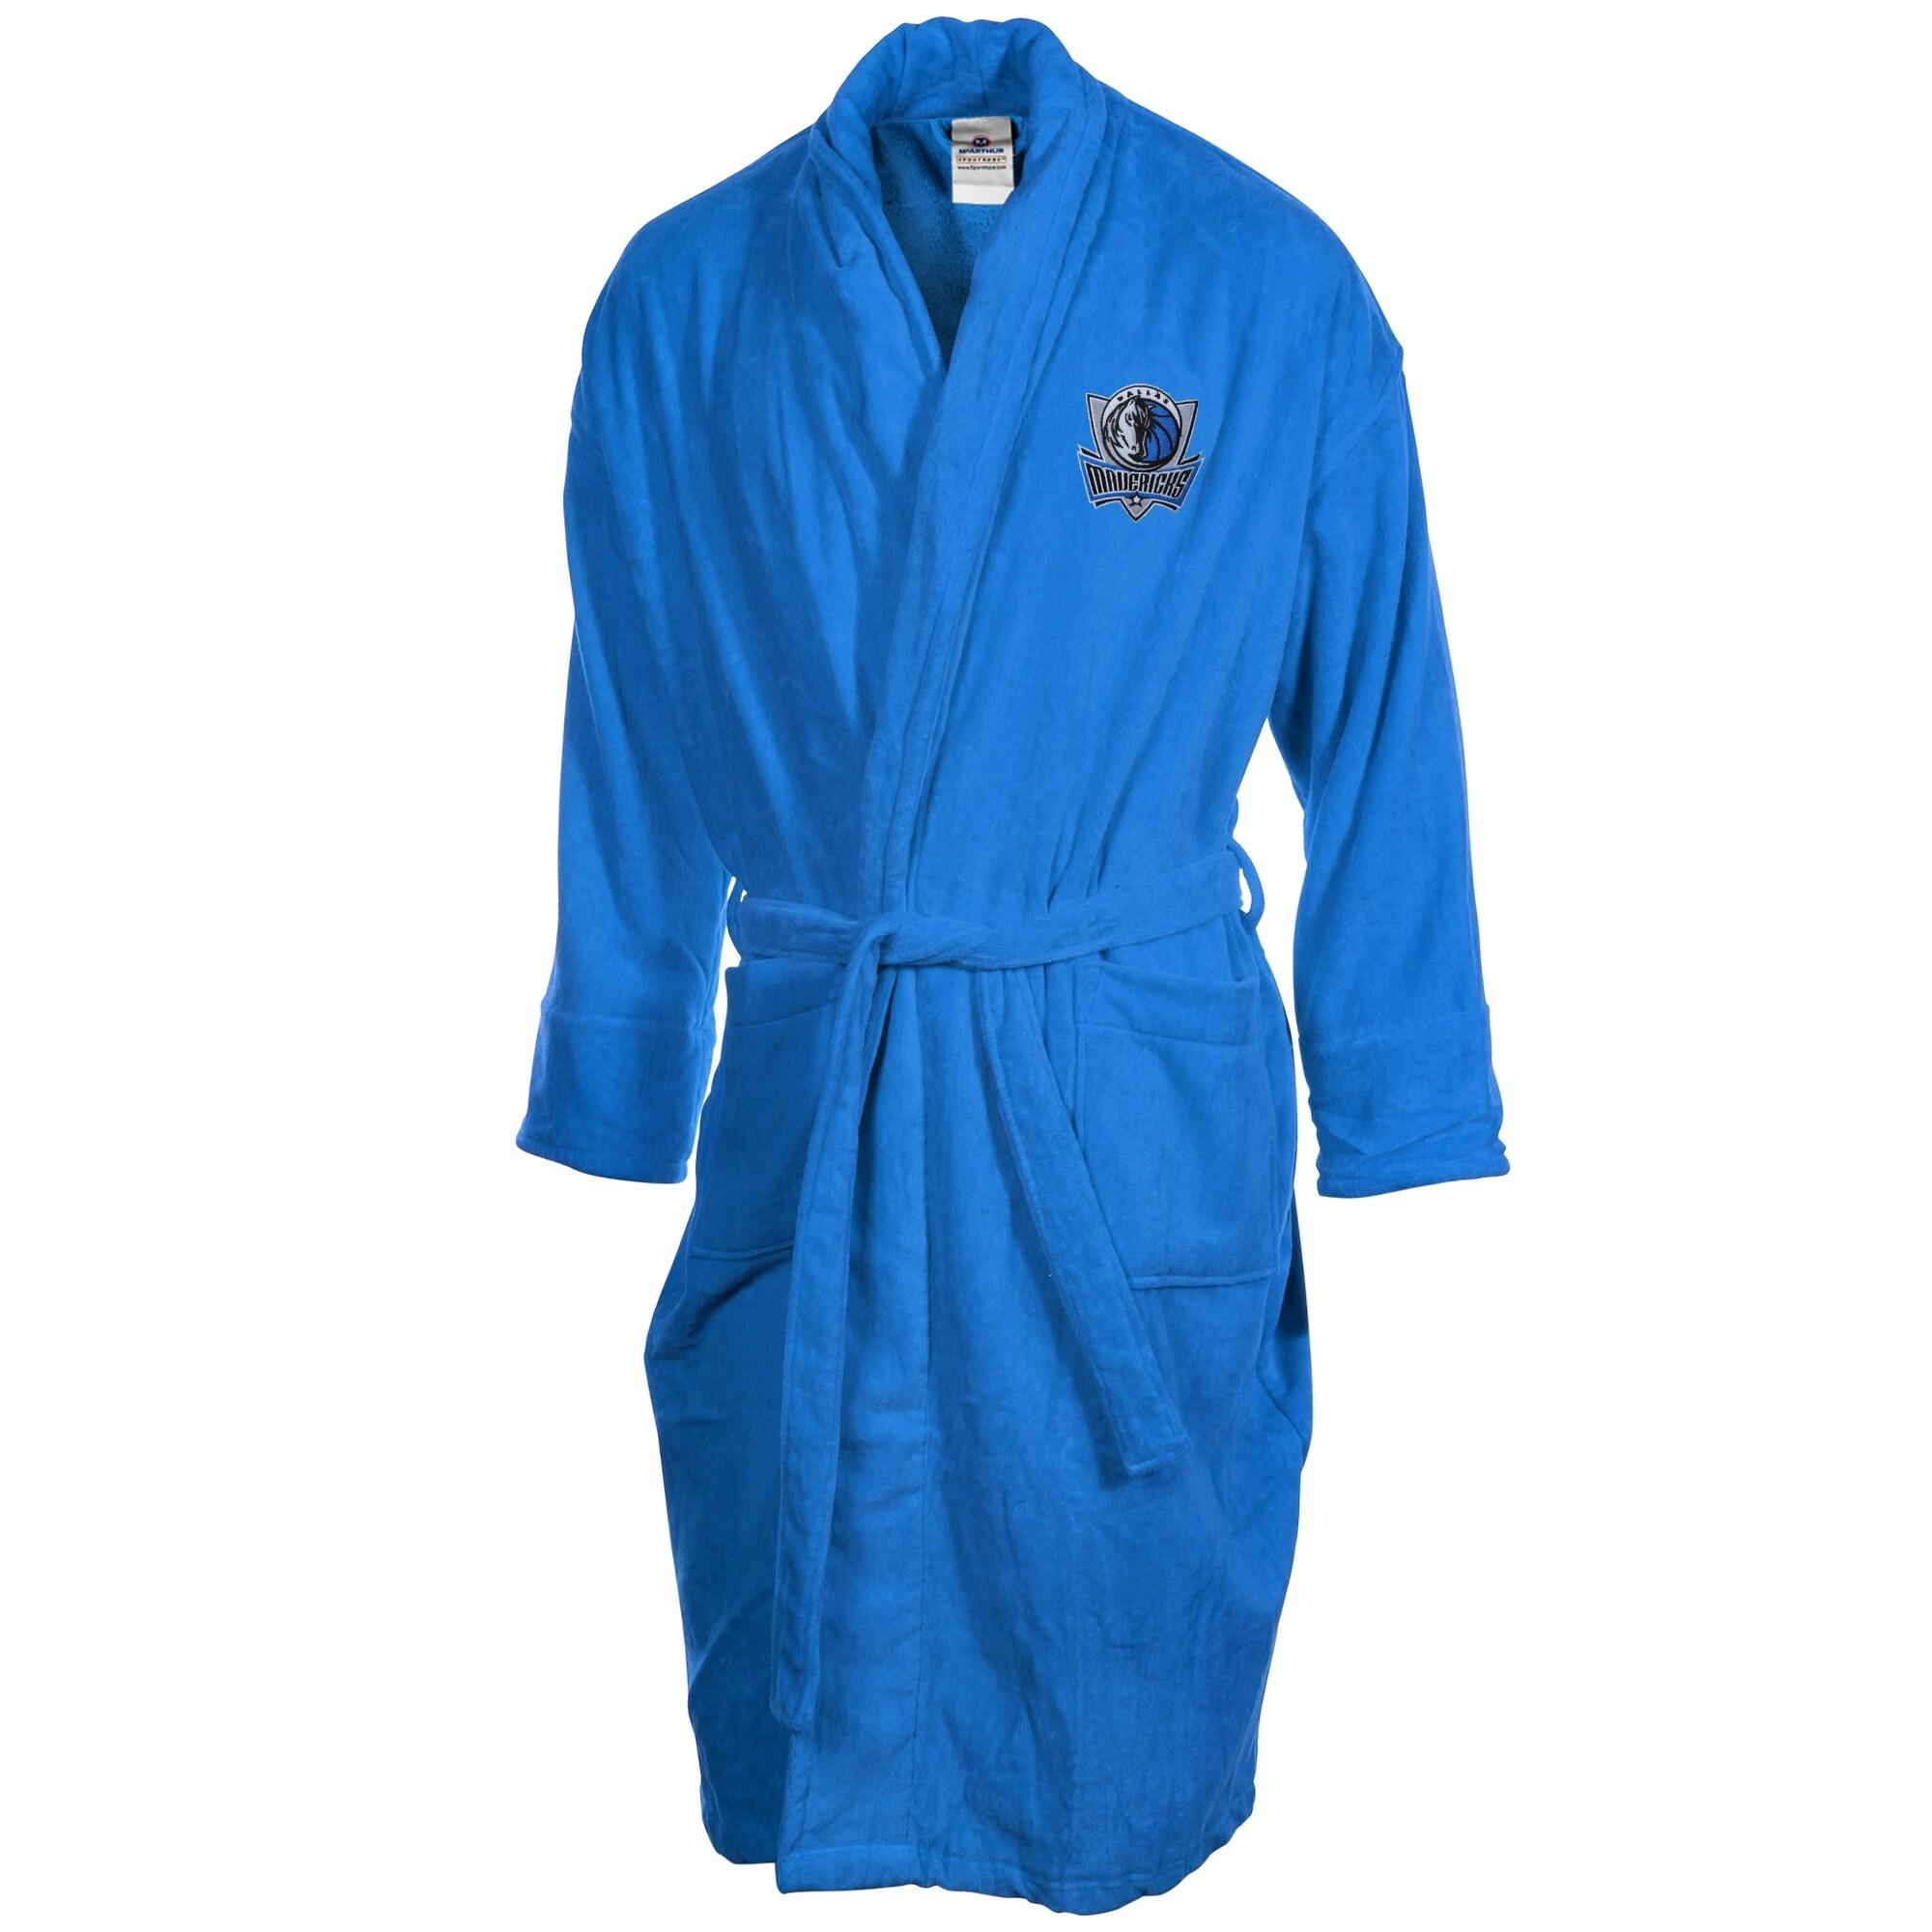 Dallas Mavericks WinCraft Robe - Blue